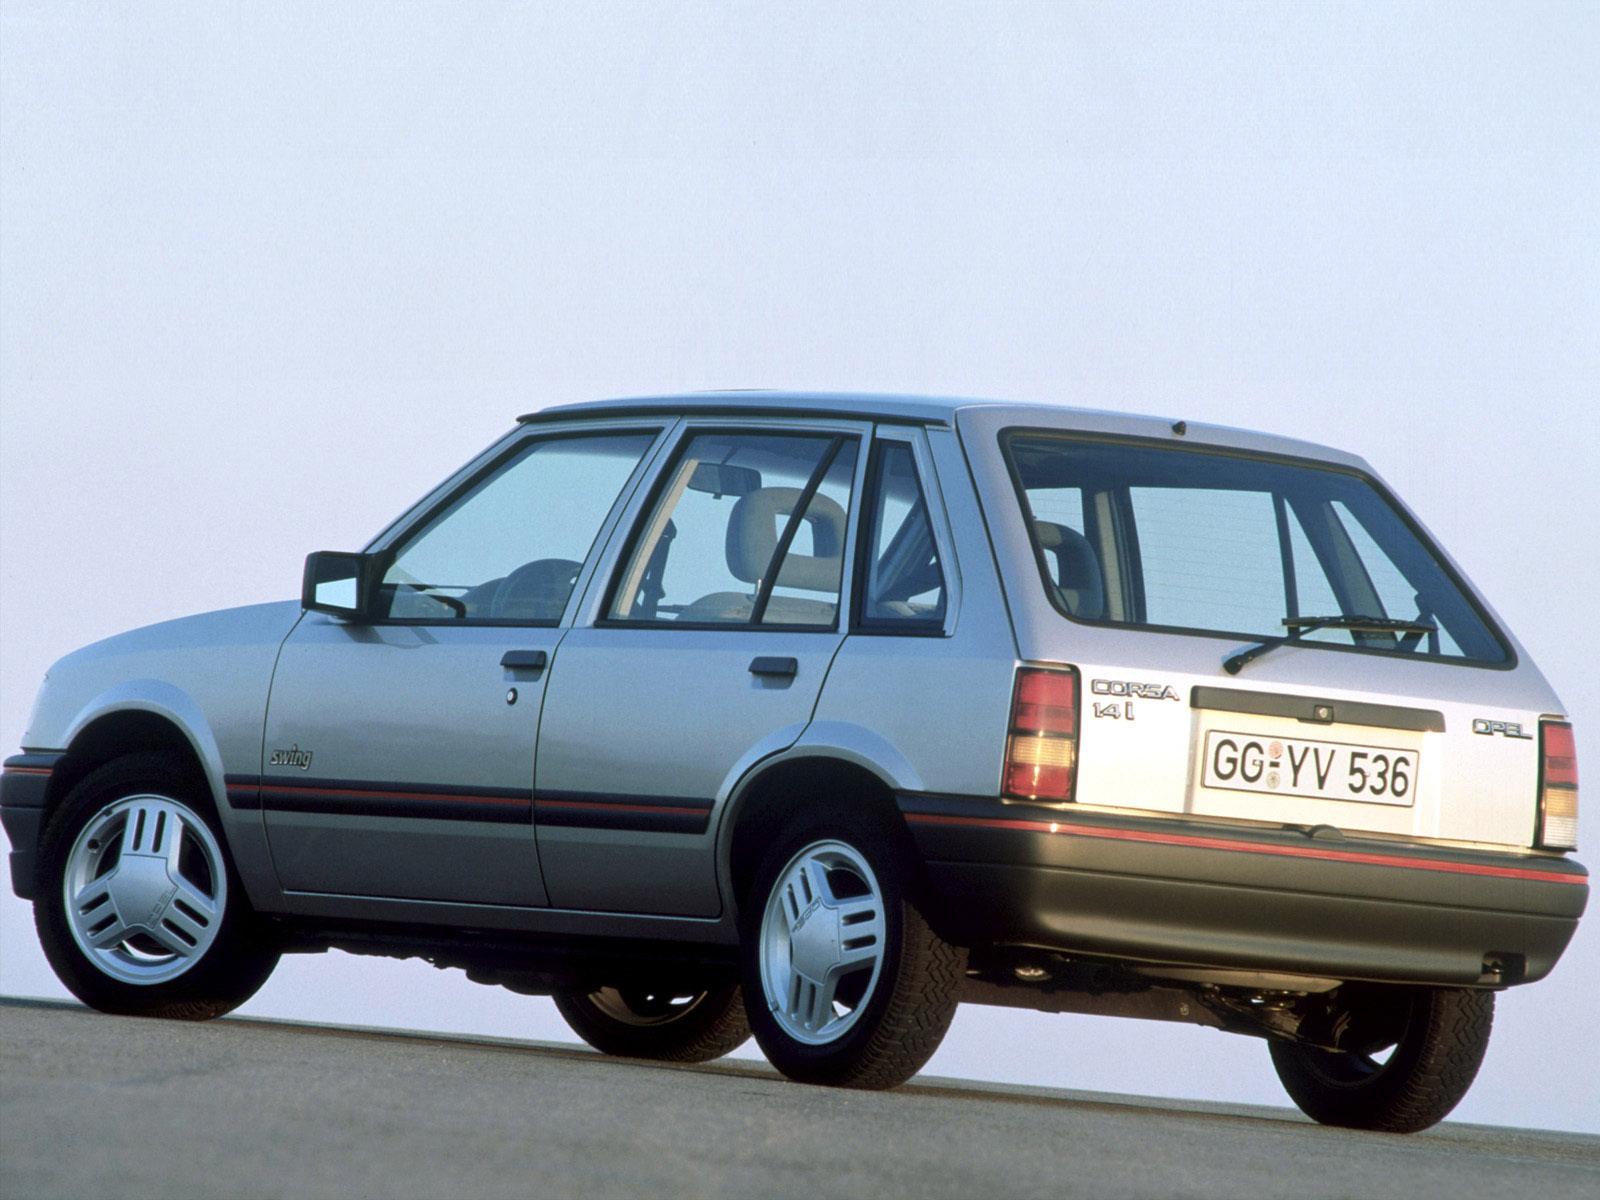 opel corsa a 5 door 1990 1993 opel corsa a 5 door 1990 1993 photo 01 car in pictures car. Black Bedroom Furniture Sets. Home Design Ideas